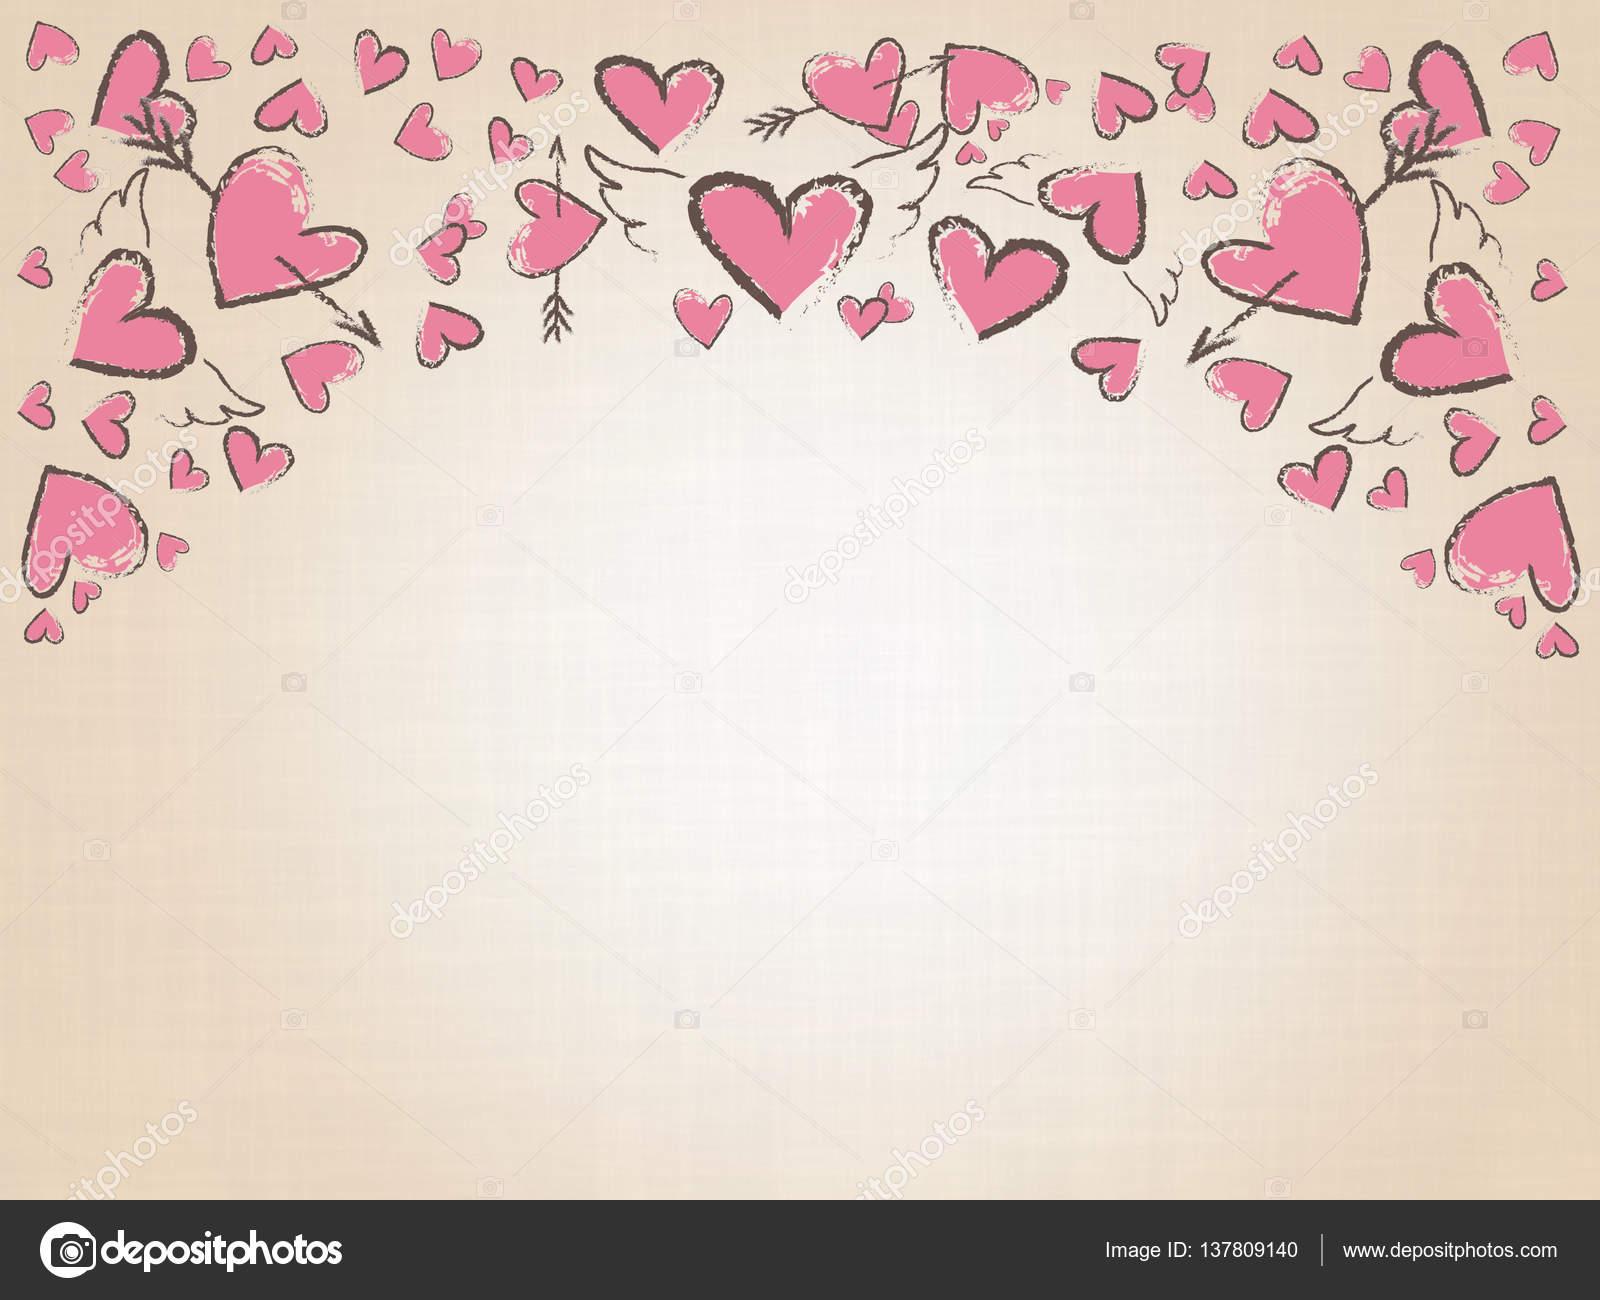 Fondo De Pantalla Dia De San Valentin Regalo Con Rosa: Hermoso Amor Corazones Sobre Fondo Vintage. Fondo De San